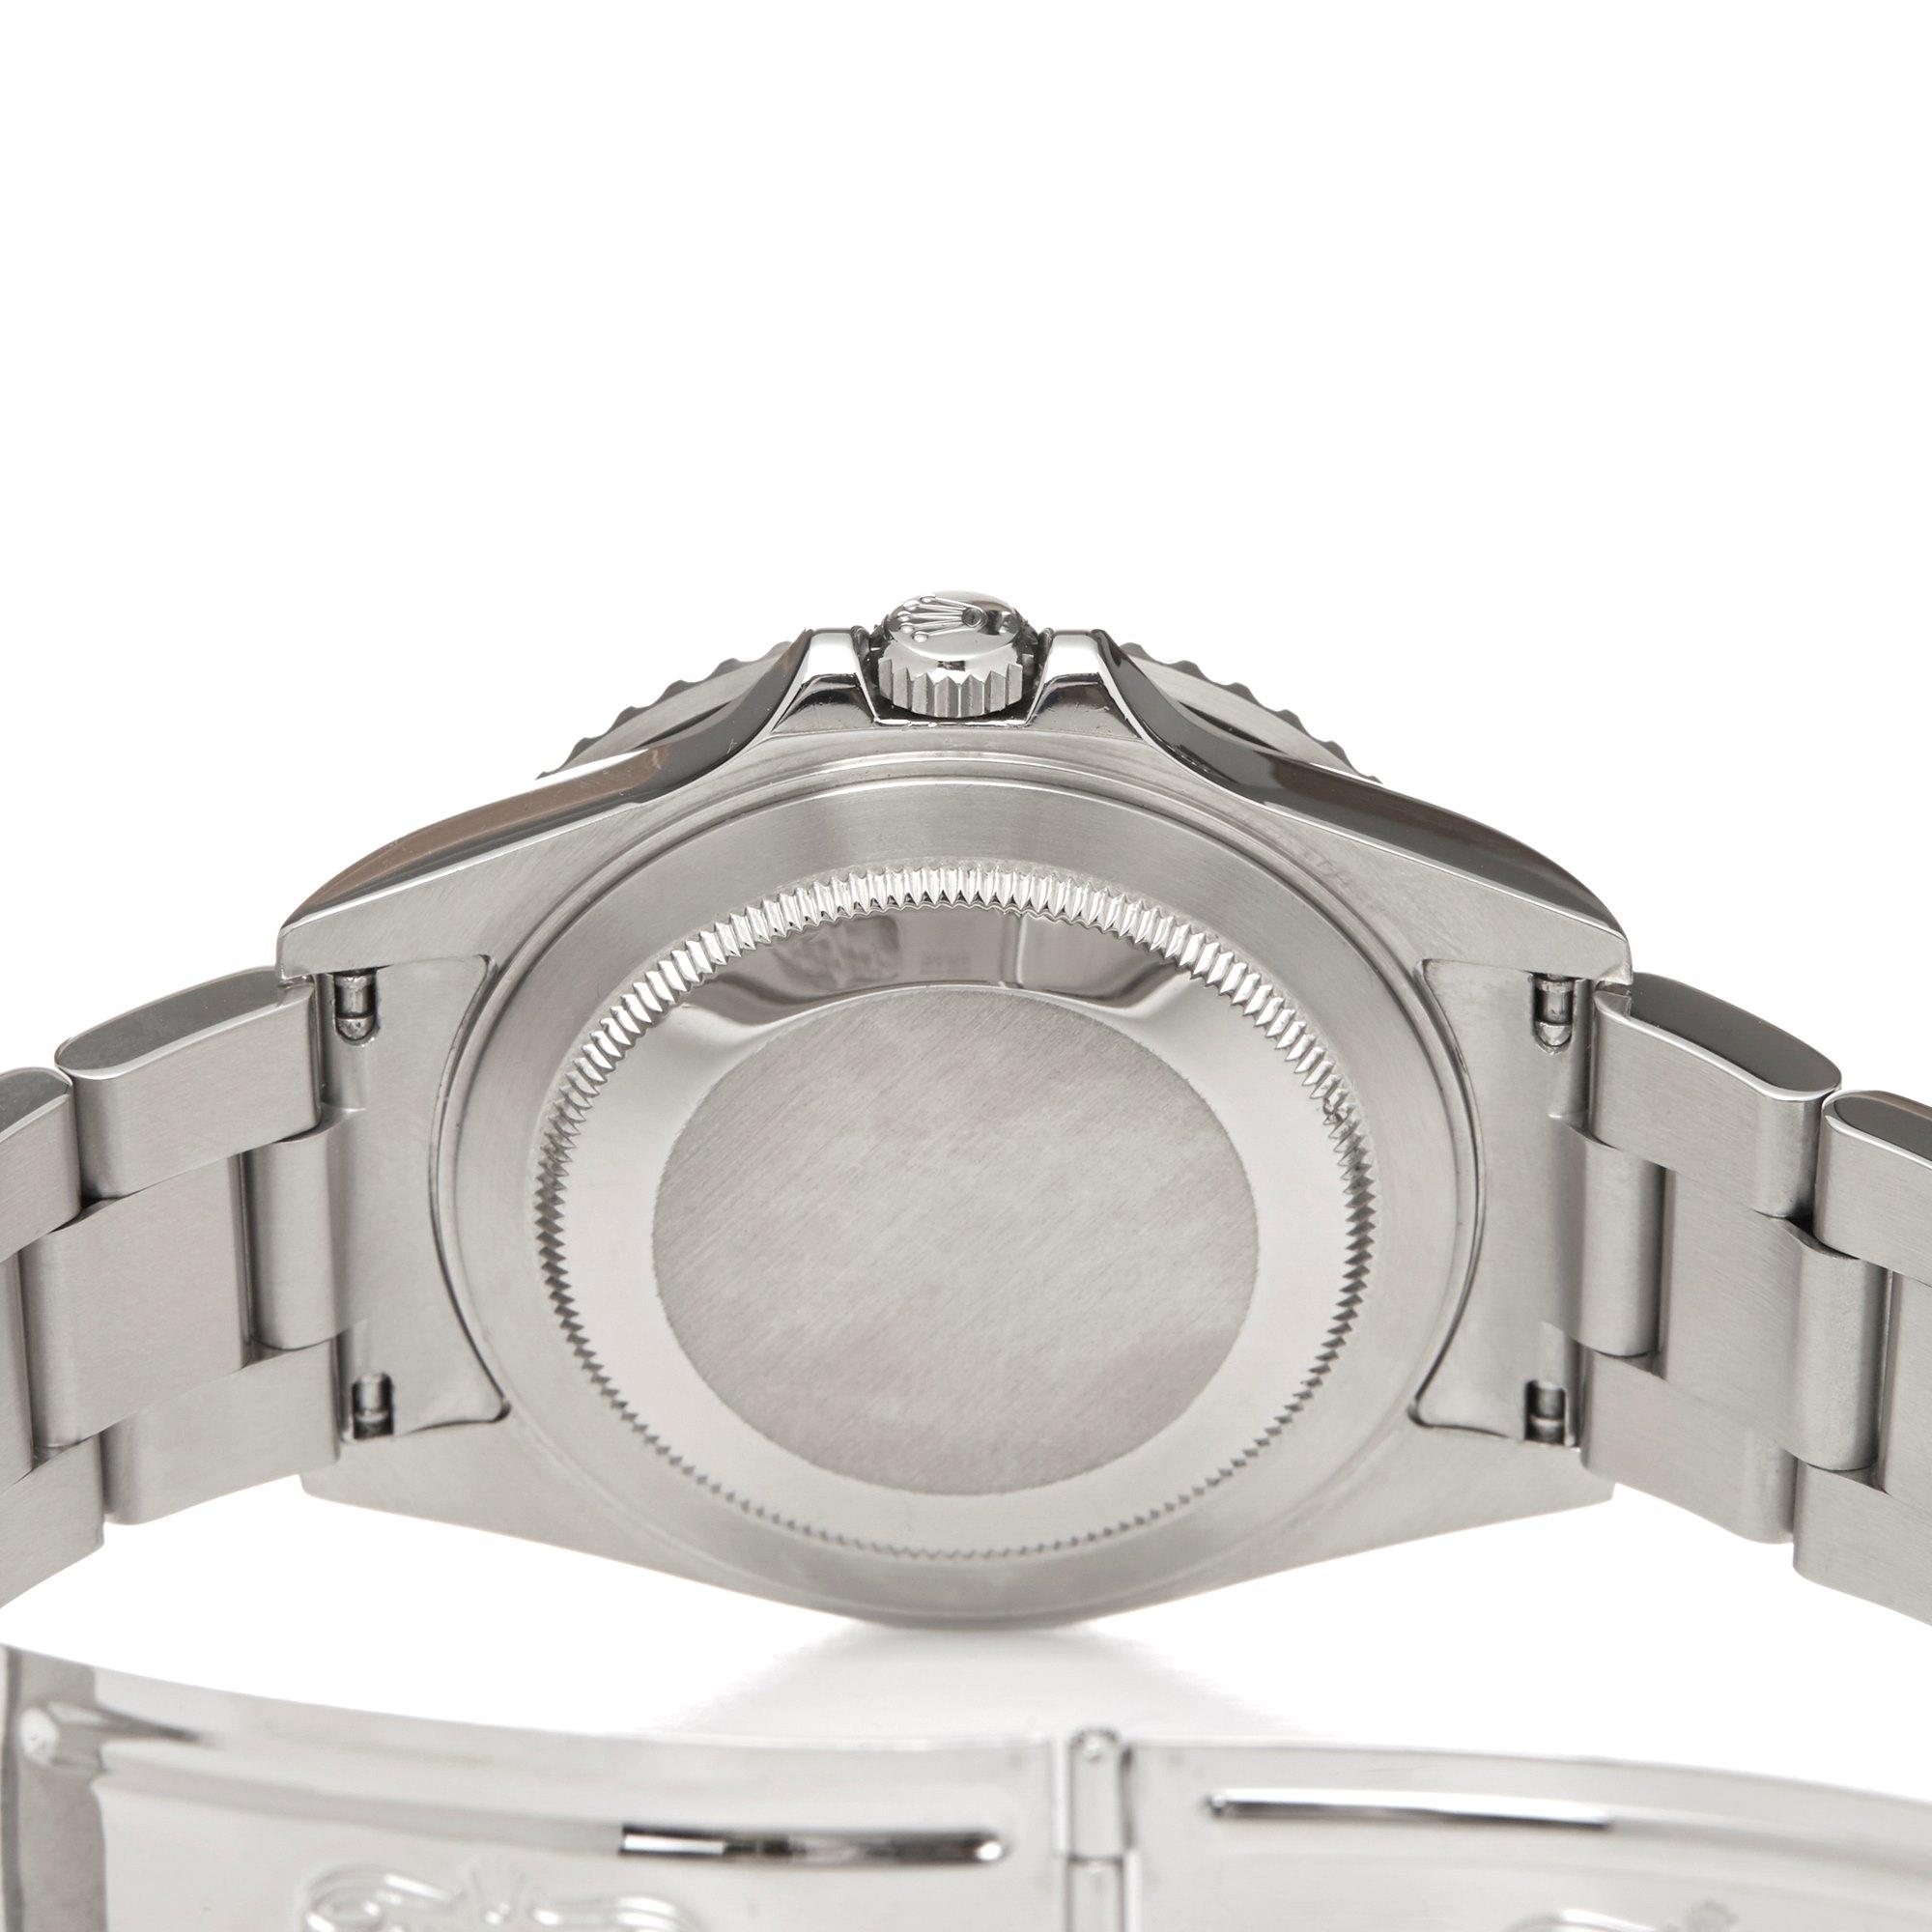 Rolex GMT-Master II Rectangular Dial Coke Roestvrij Staal 16710